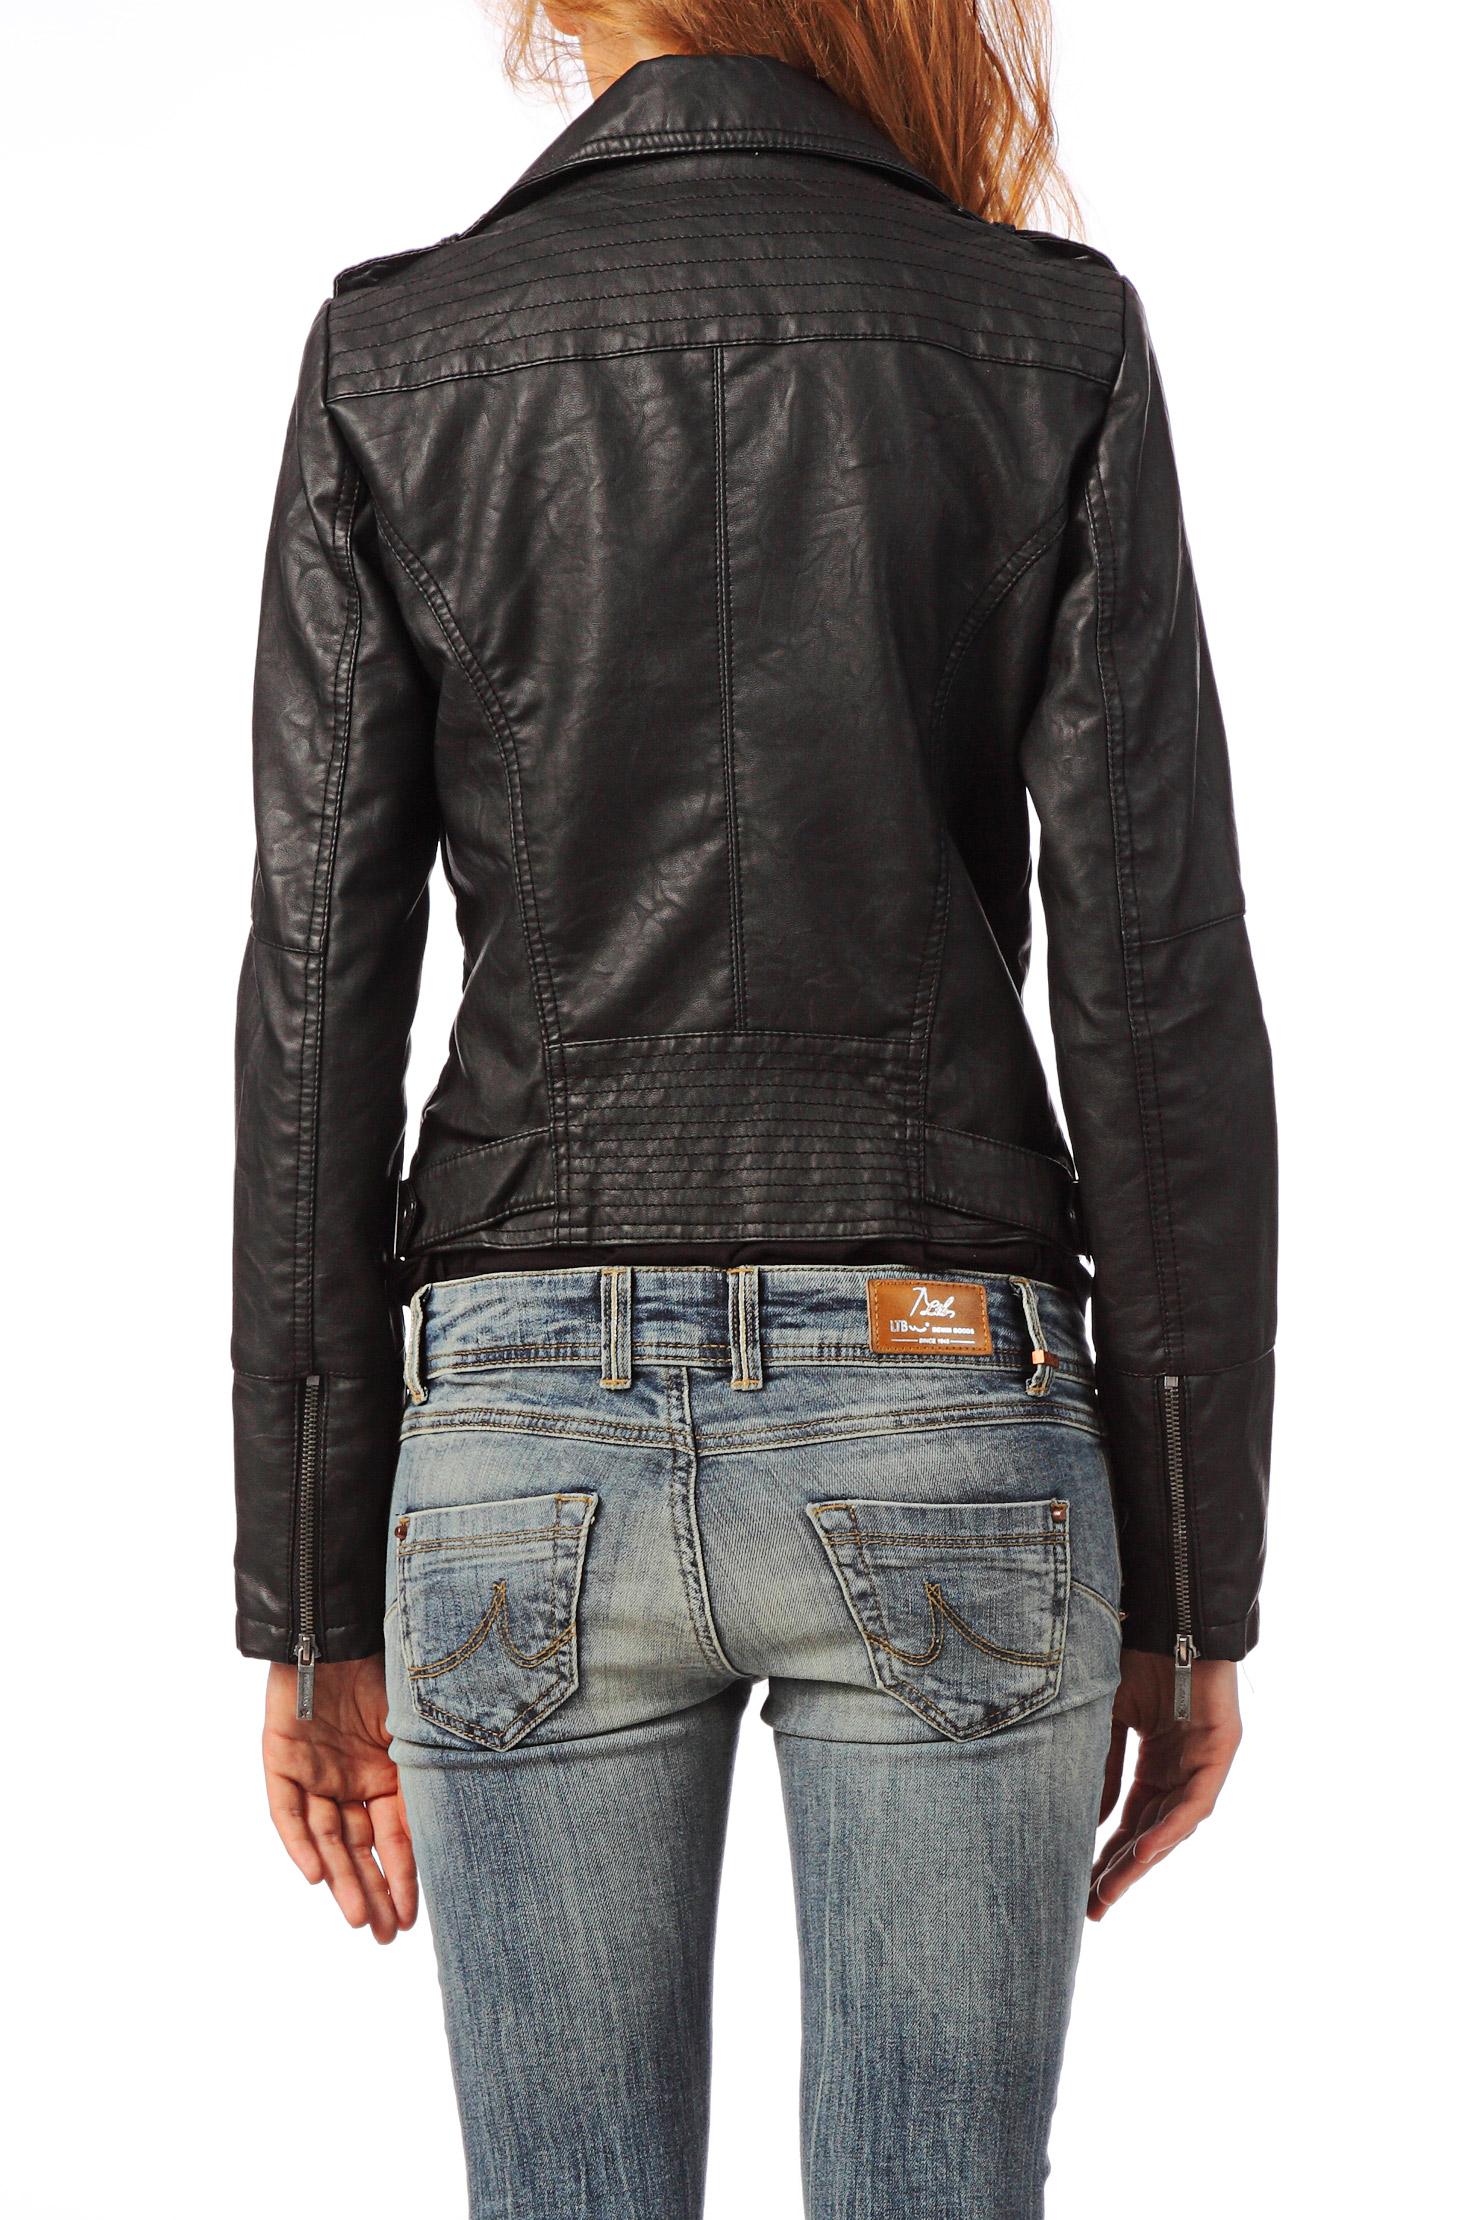 lyst pepe jeans leather jacket pap in black. Black Bedroom Furniture Sets. Home Design Ideas